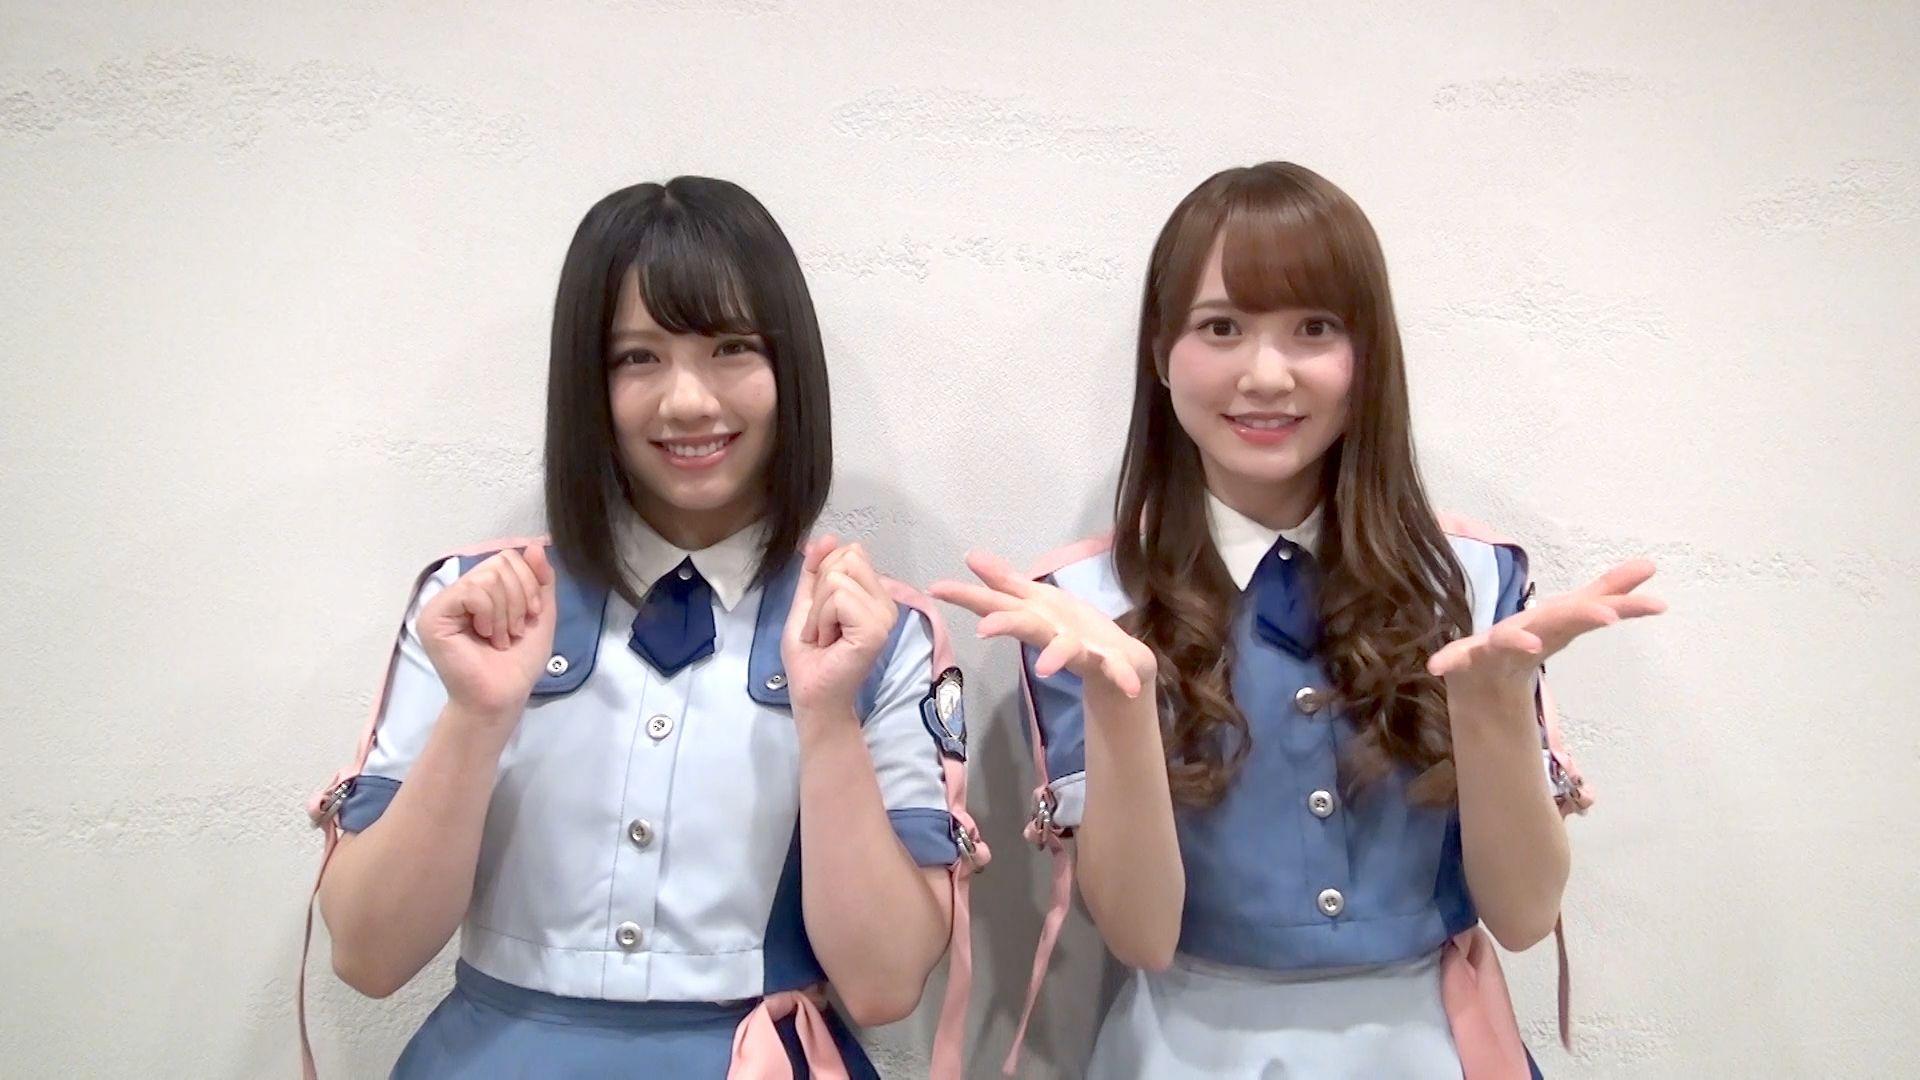 VMAJ2019 記者会見での熱い誓い! 渡邉美穂編